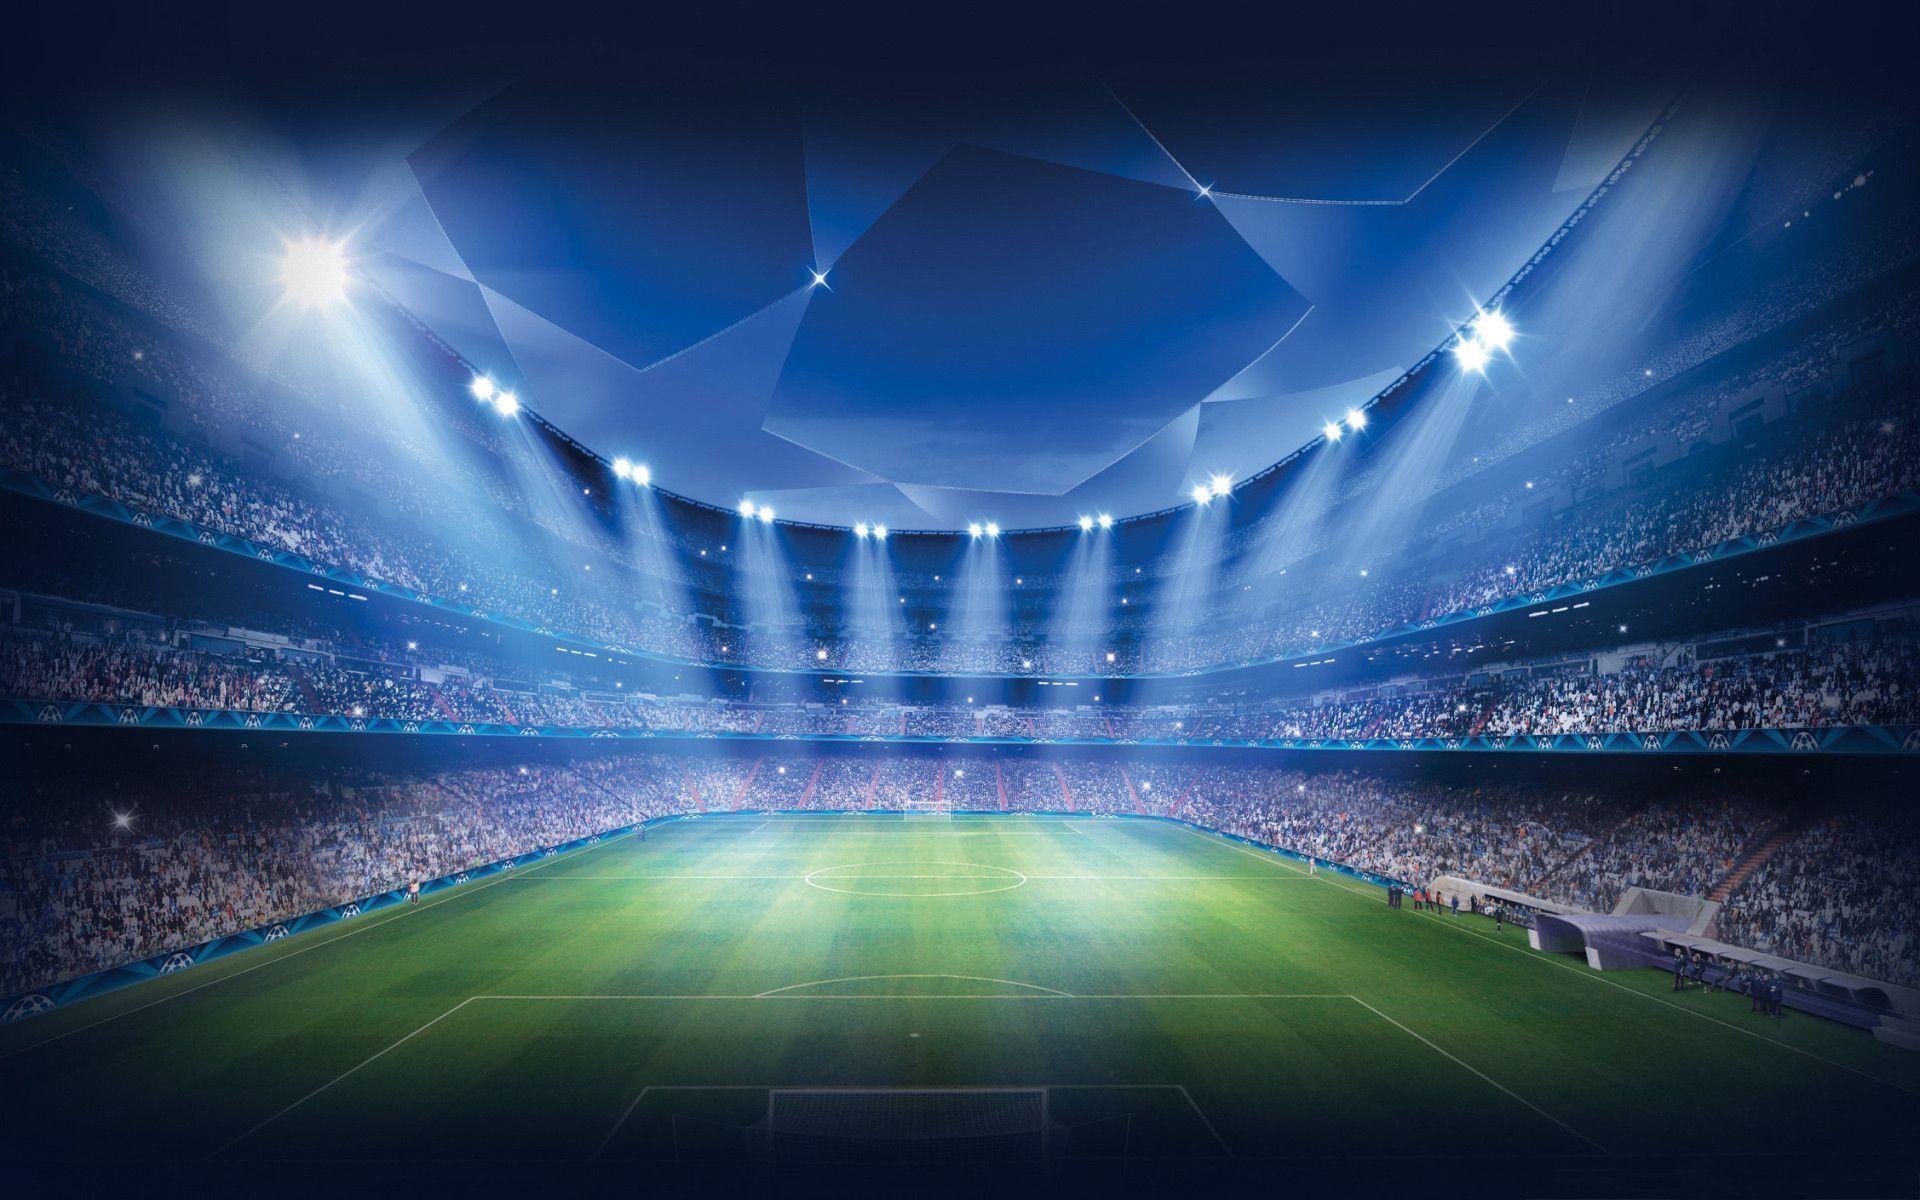 Nfl football field wallpaper 49 images - Football field wallpaper hd ...